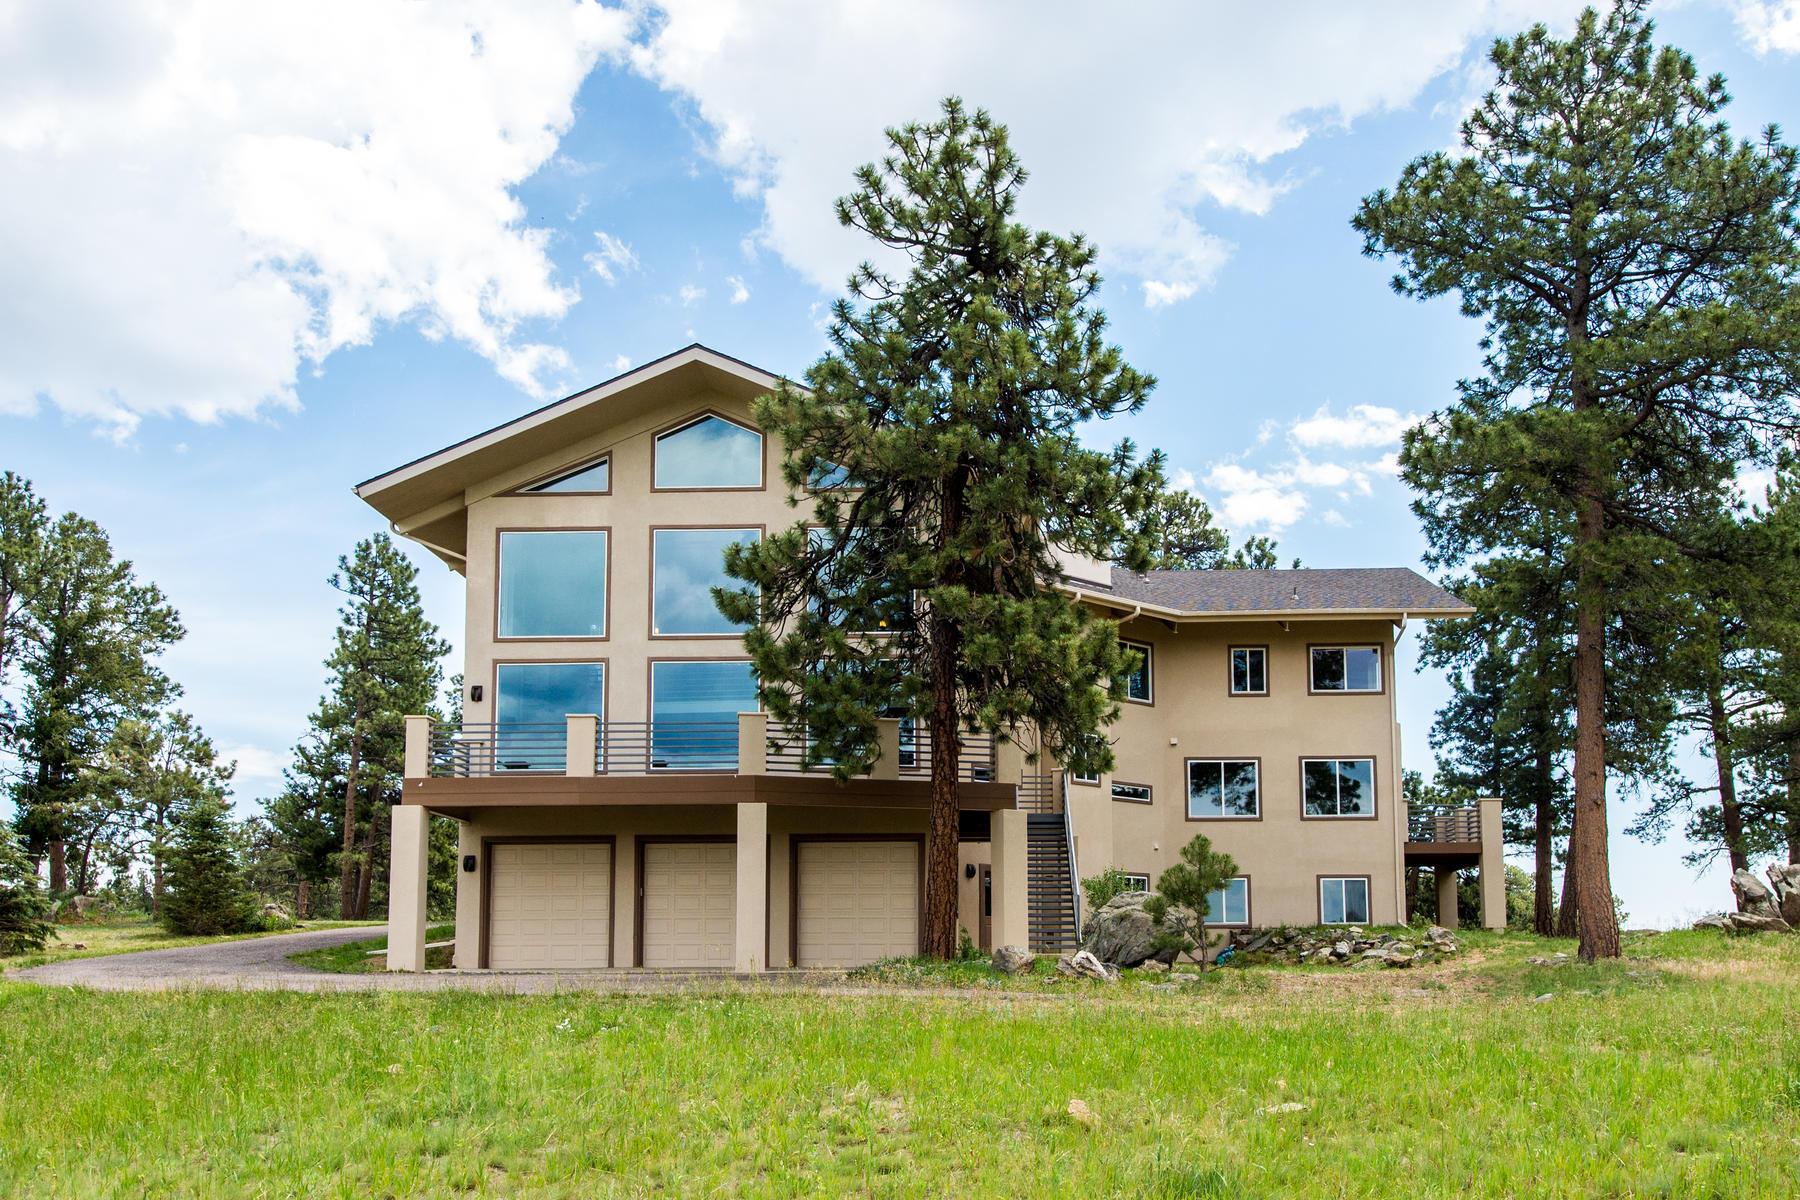 独户住宅 为 销售 在 Open Floor Plan with Stunning Mt Evans Views 1523 Copper Rose Drive 戈尔登, 科罗拉多州 80401 美国